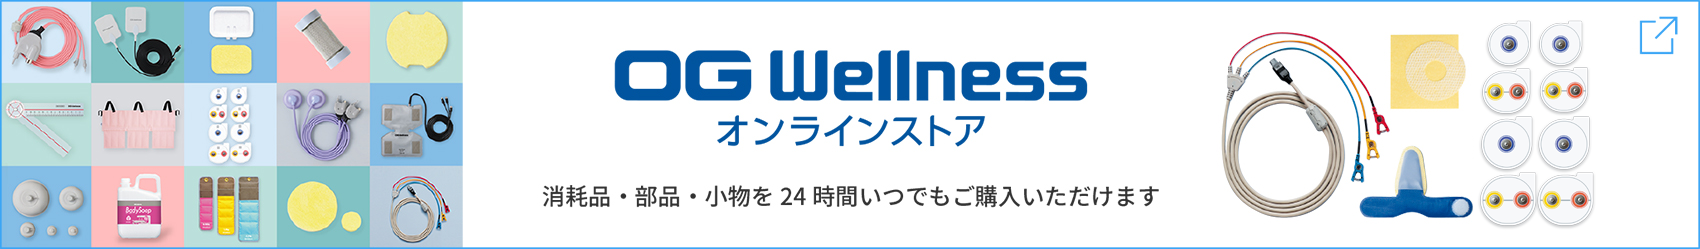 OG Wellnessオンラインストア